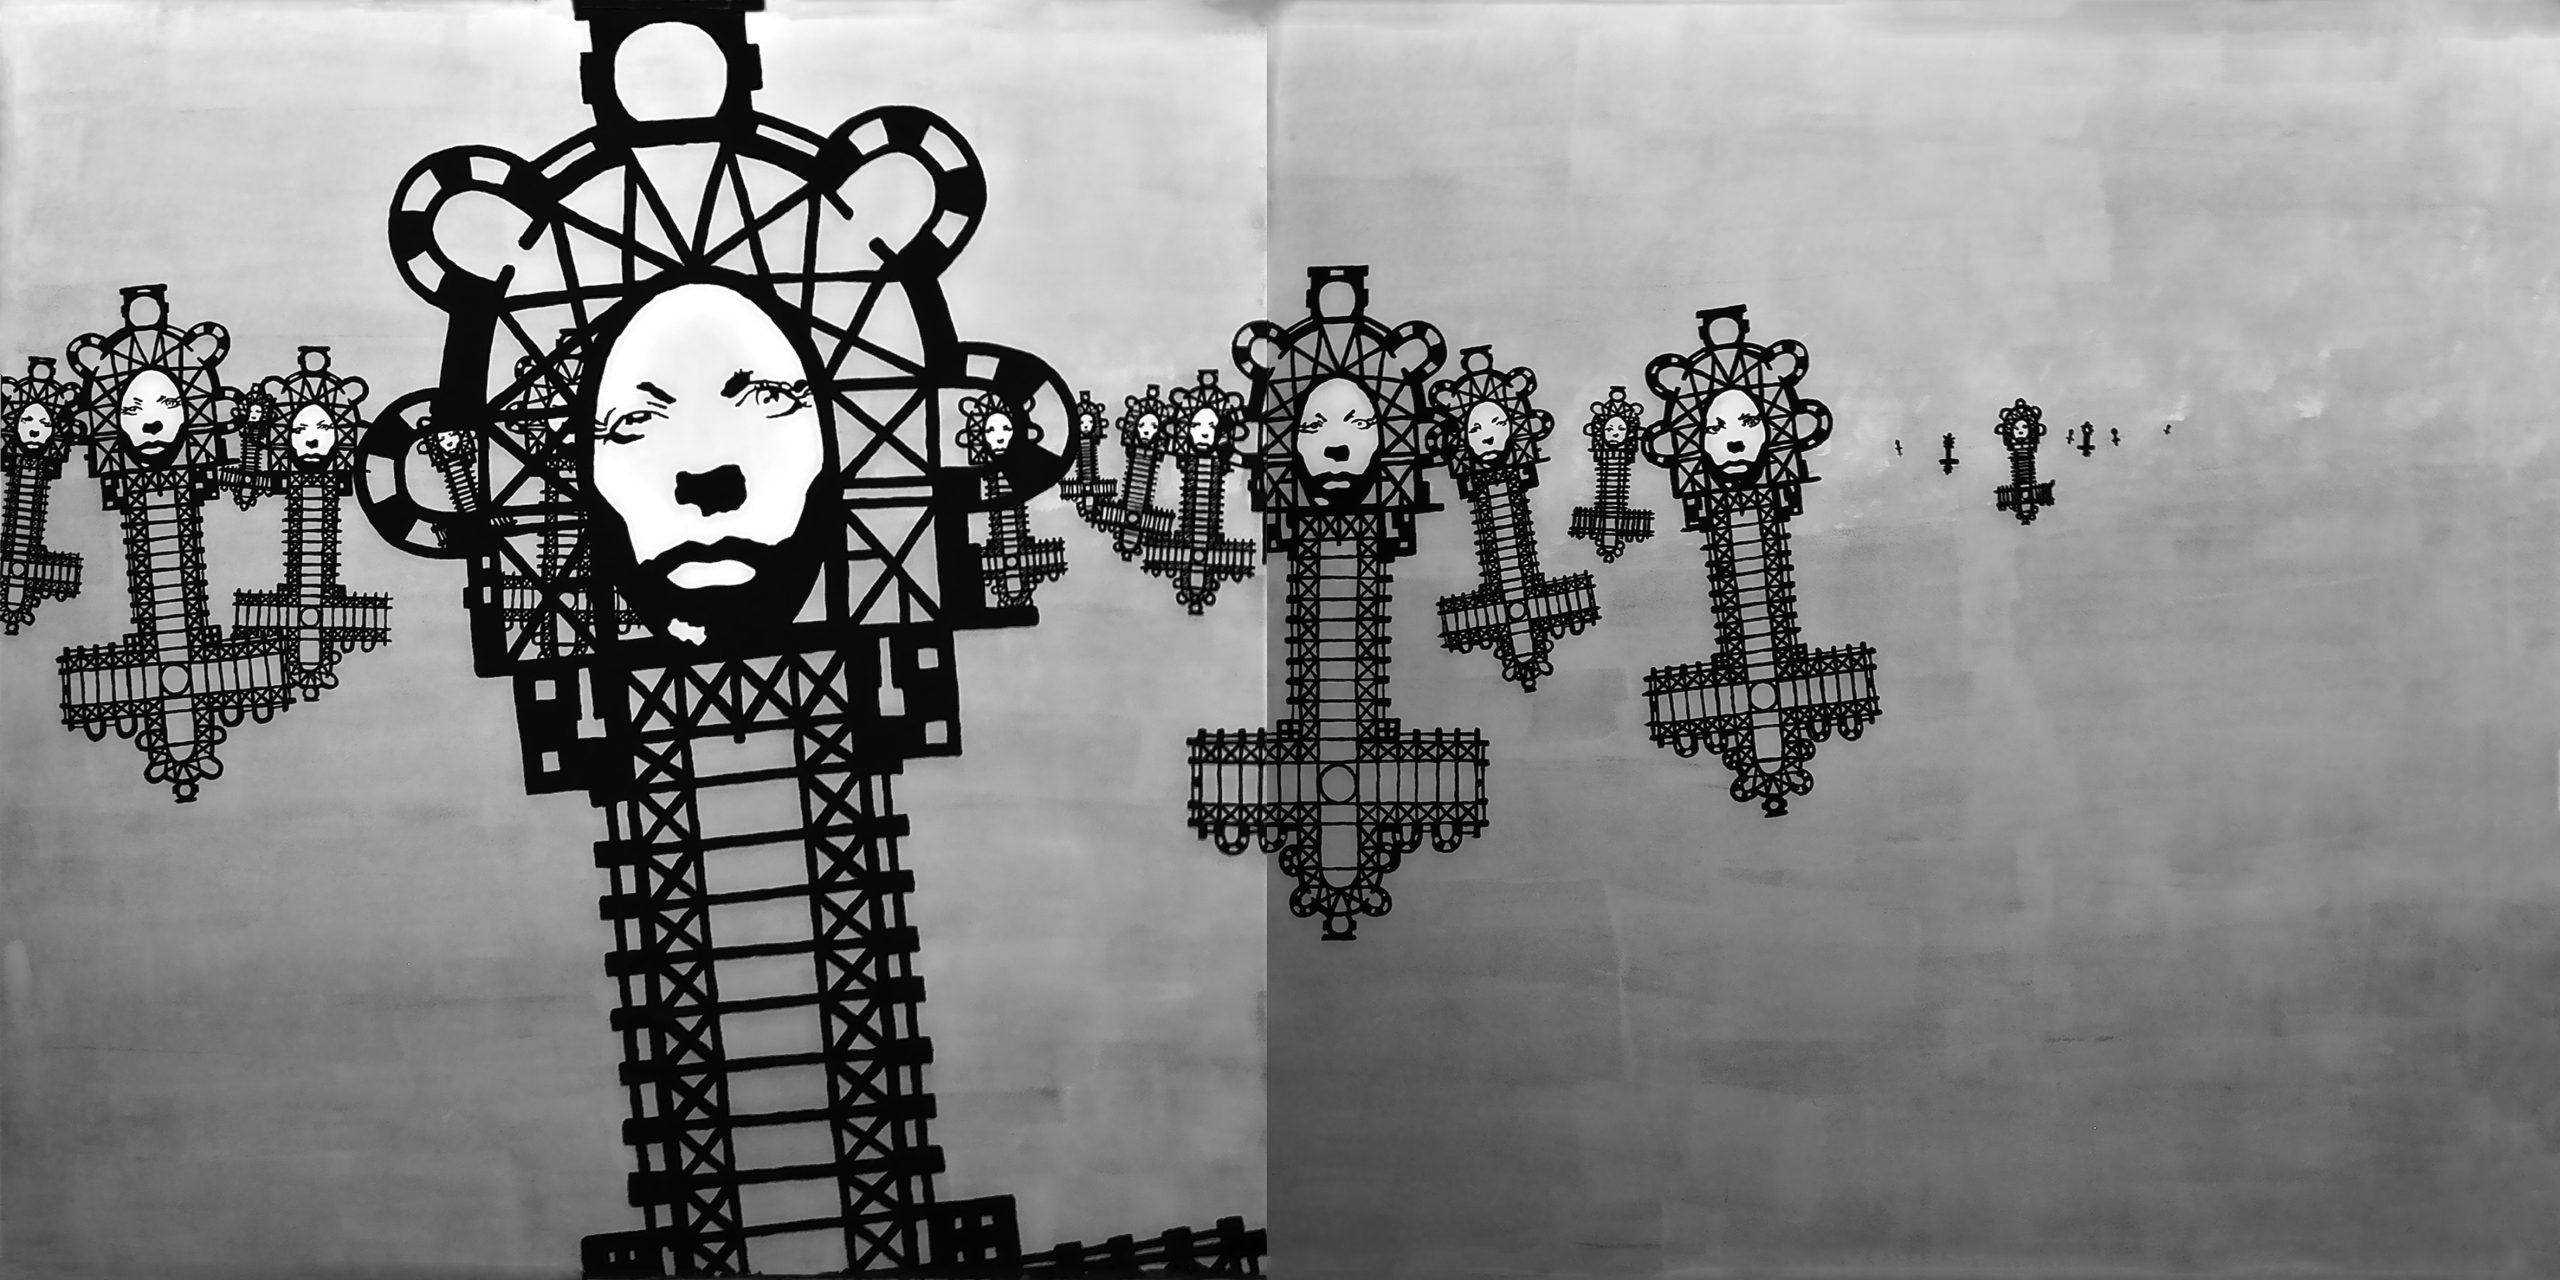 Corpus Christi/corpus delicti, 100 x 200, akryl na pleksi, 2011